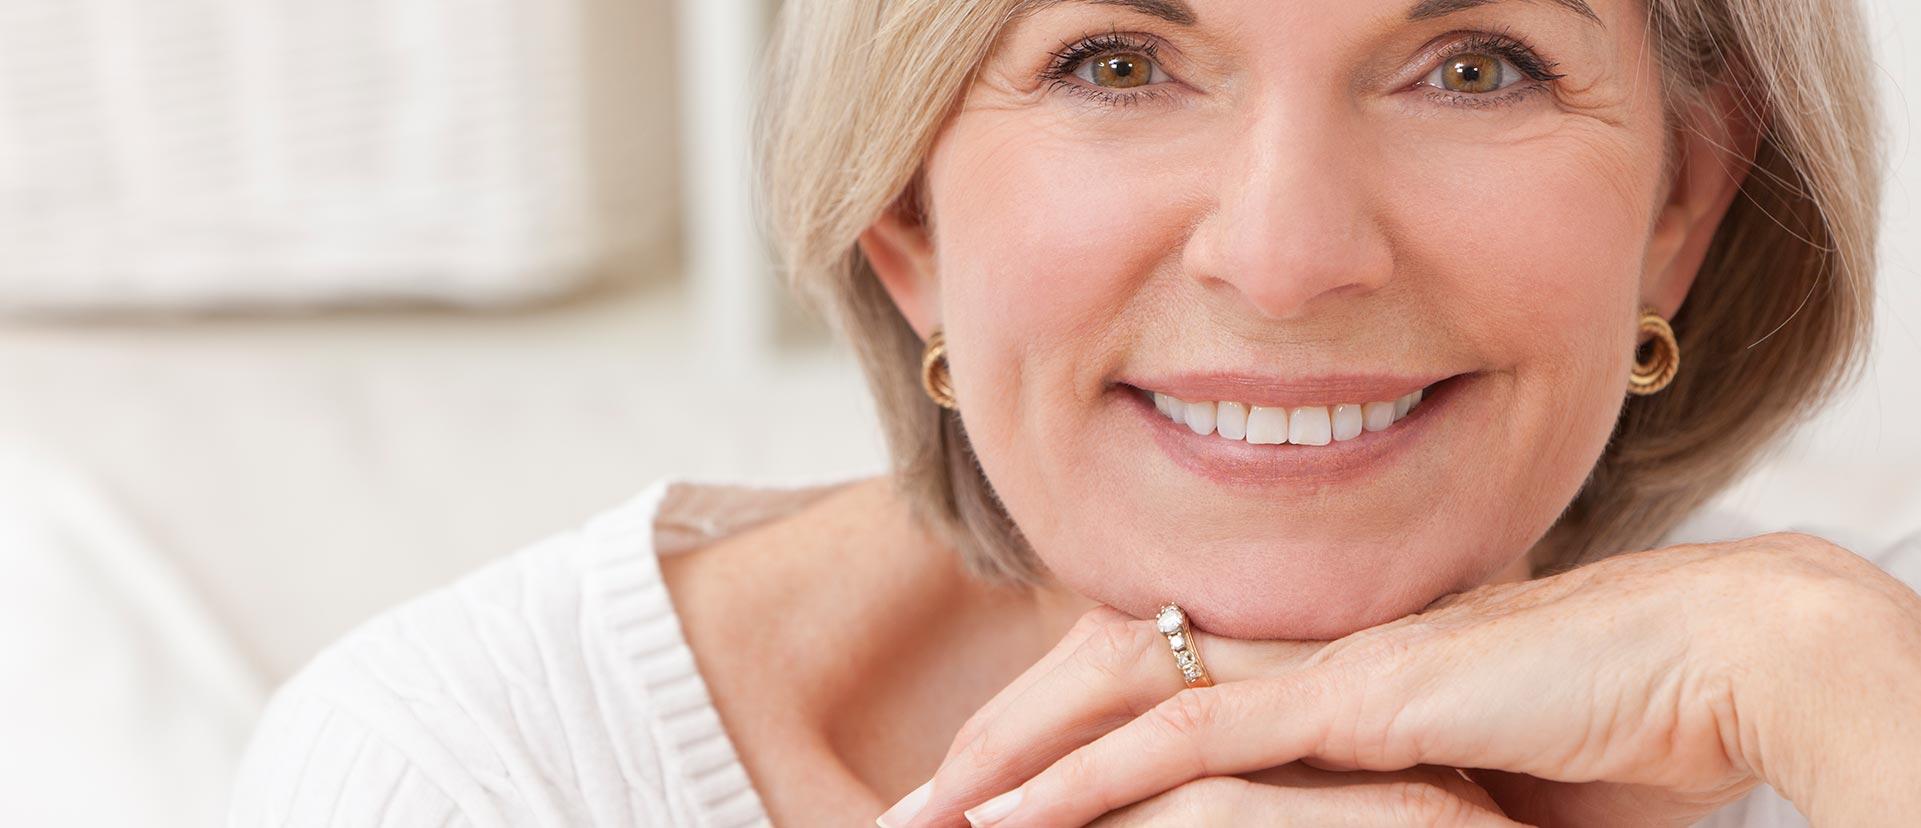 Woman wearing a denture